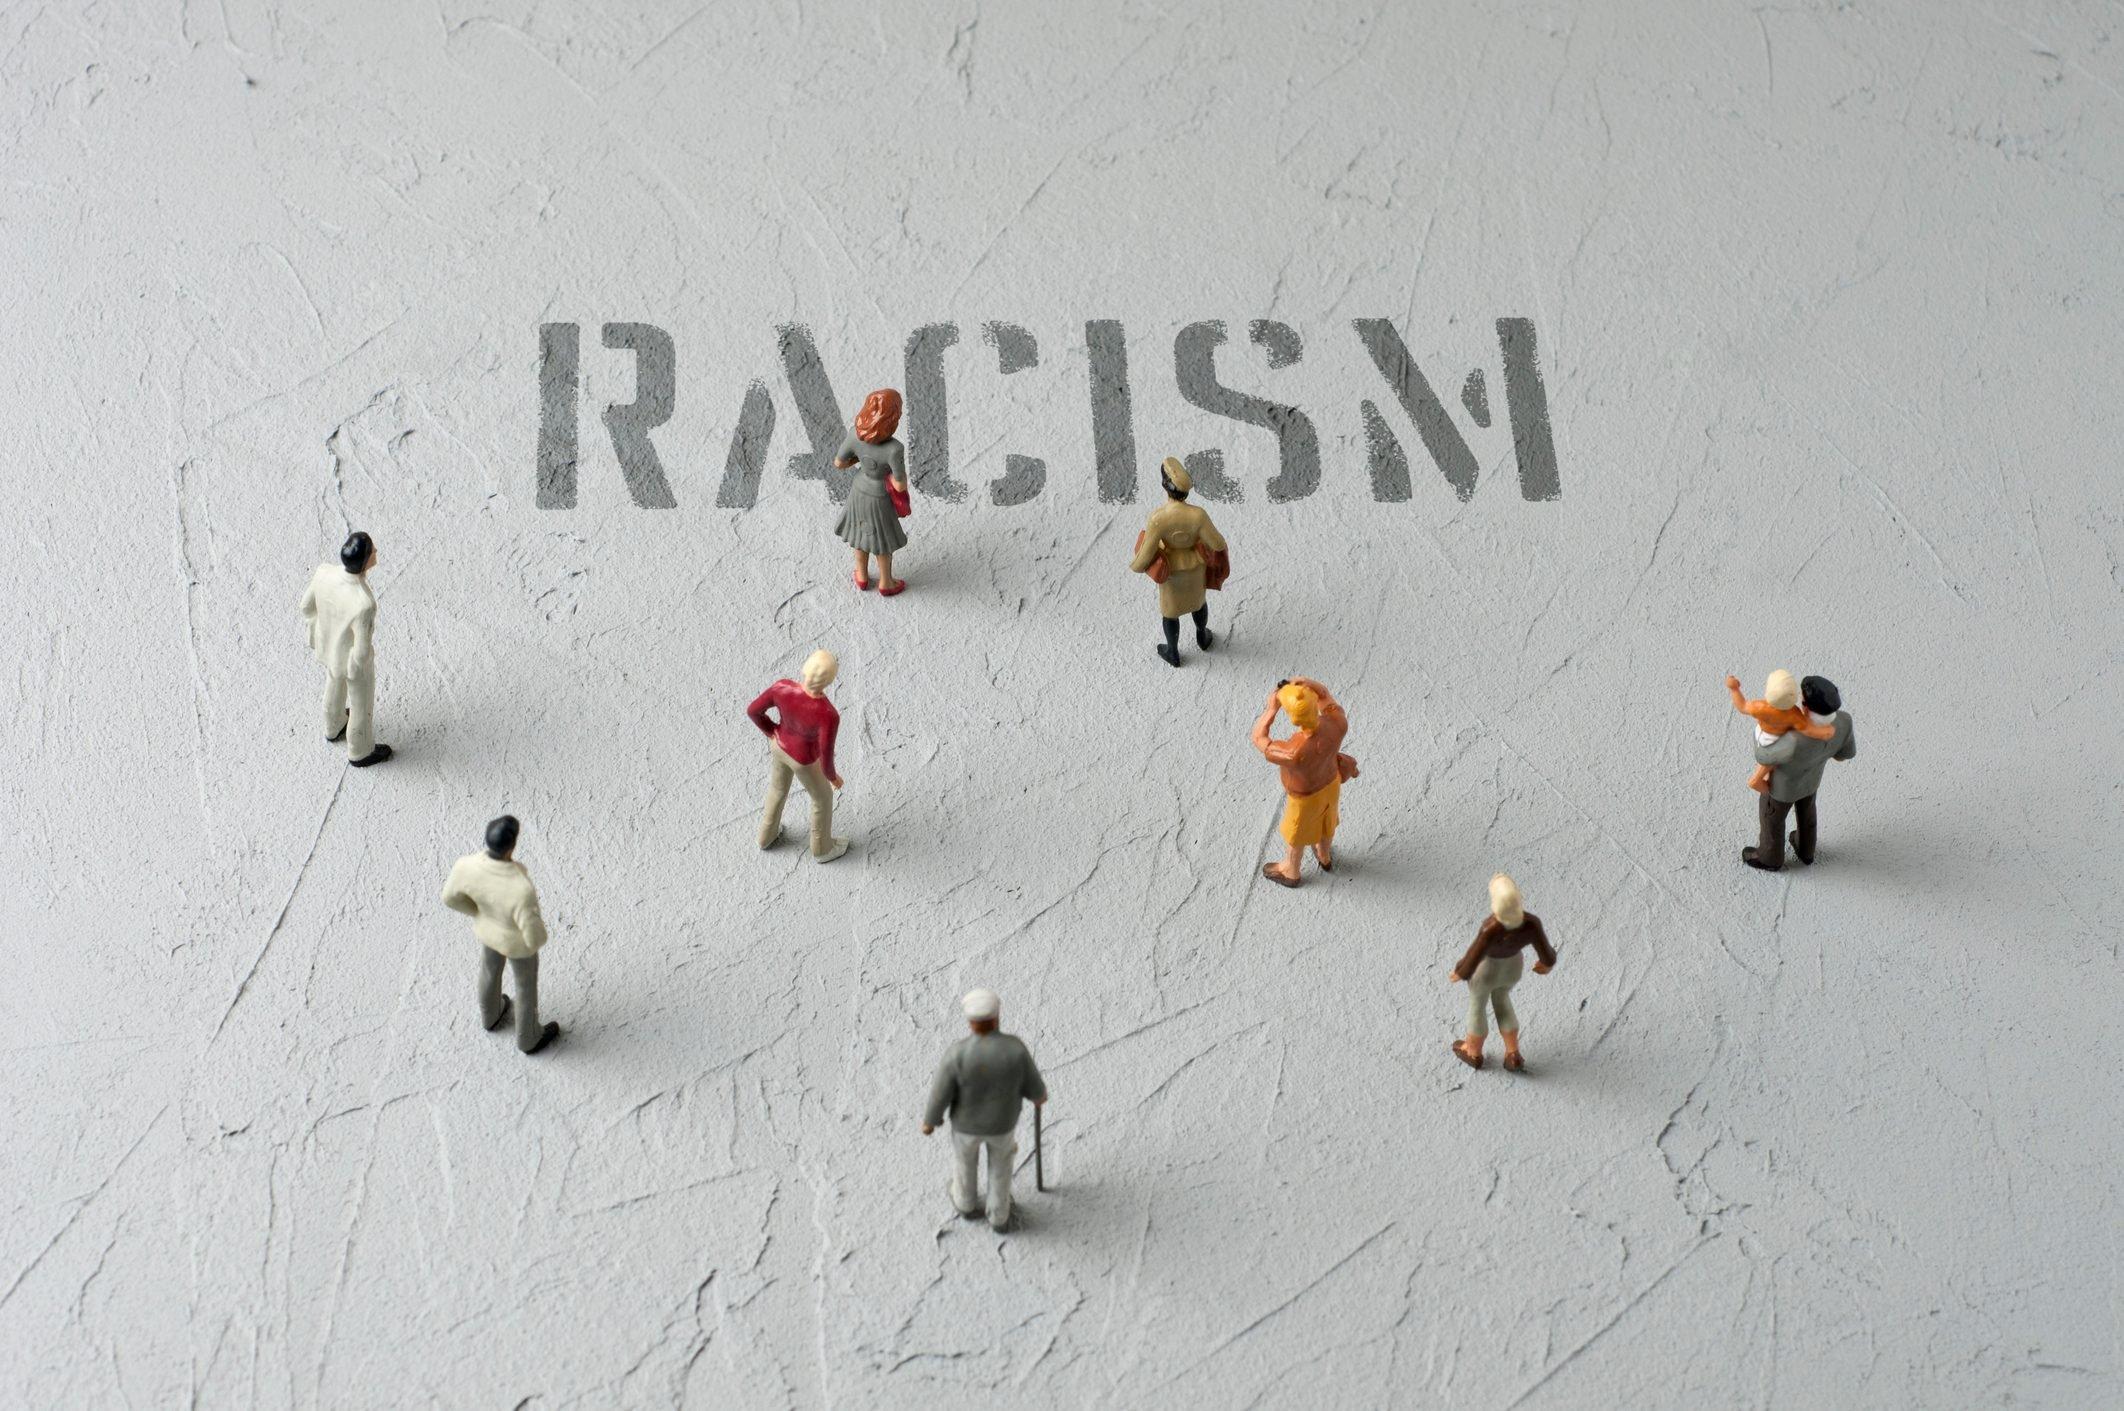 Dystopia: Racism